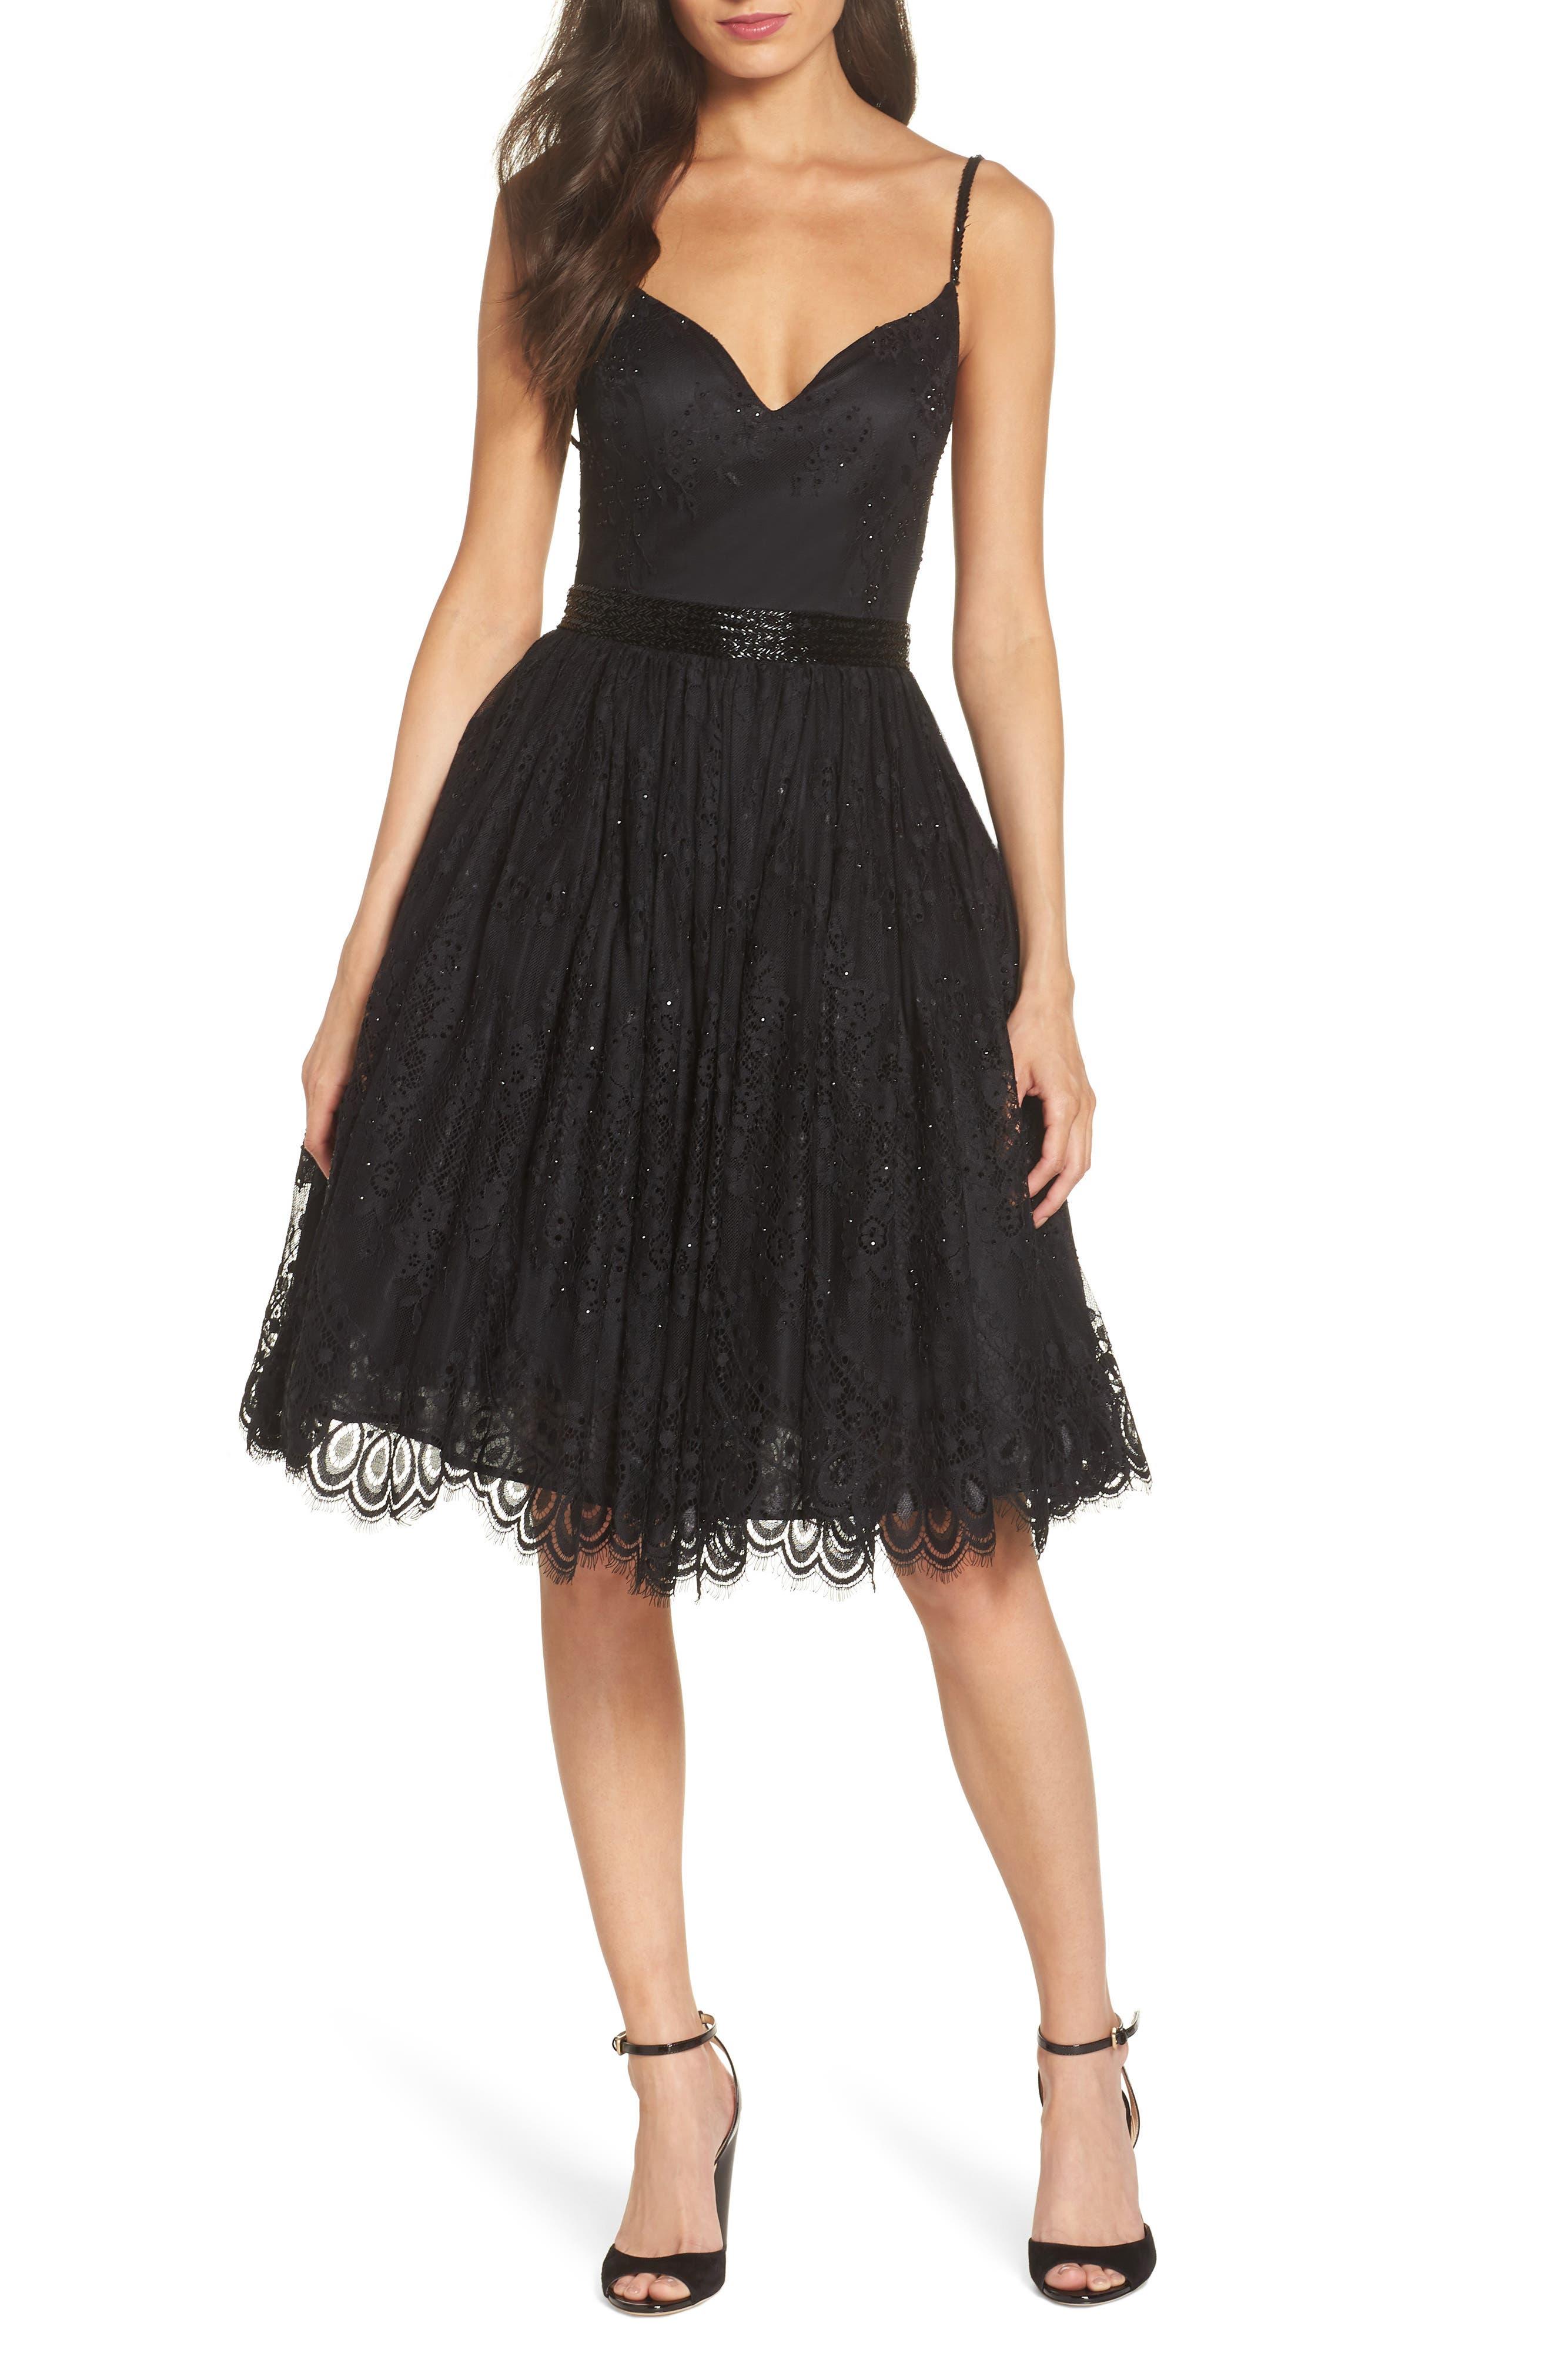 MAC DUGGAL, Sweetheart Neck Lace Party Dress, Main thumbnail 1, color, BLACK